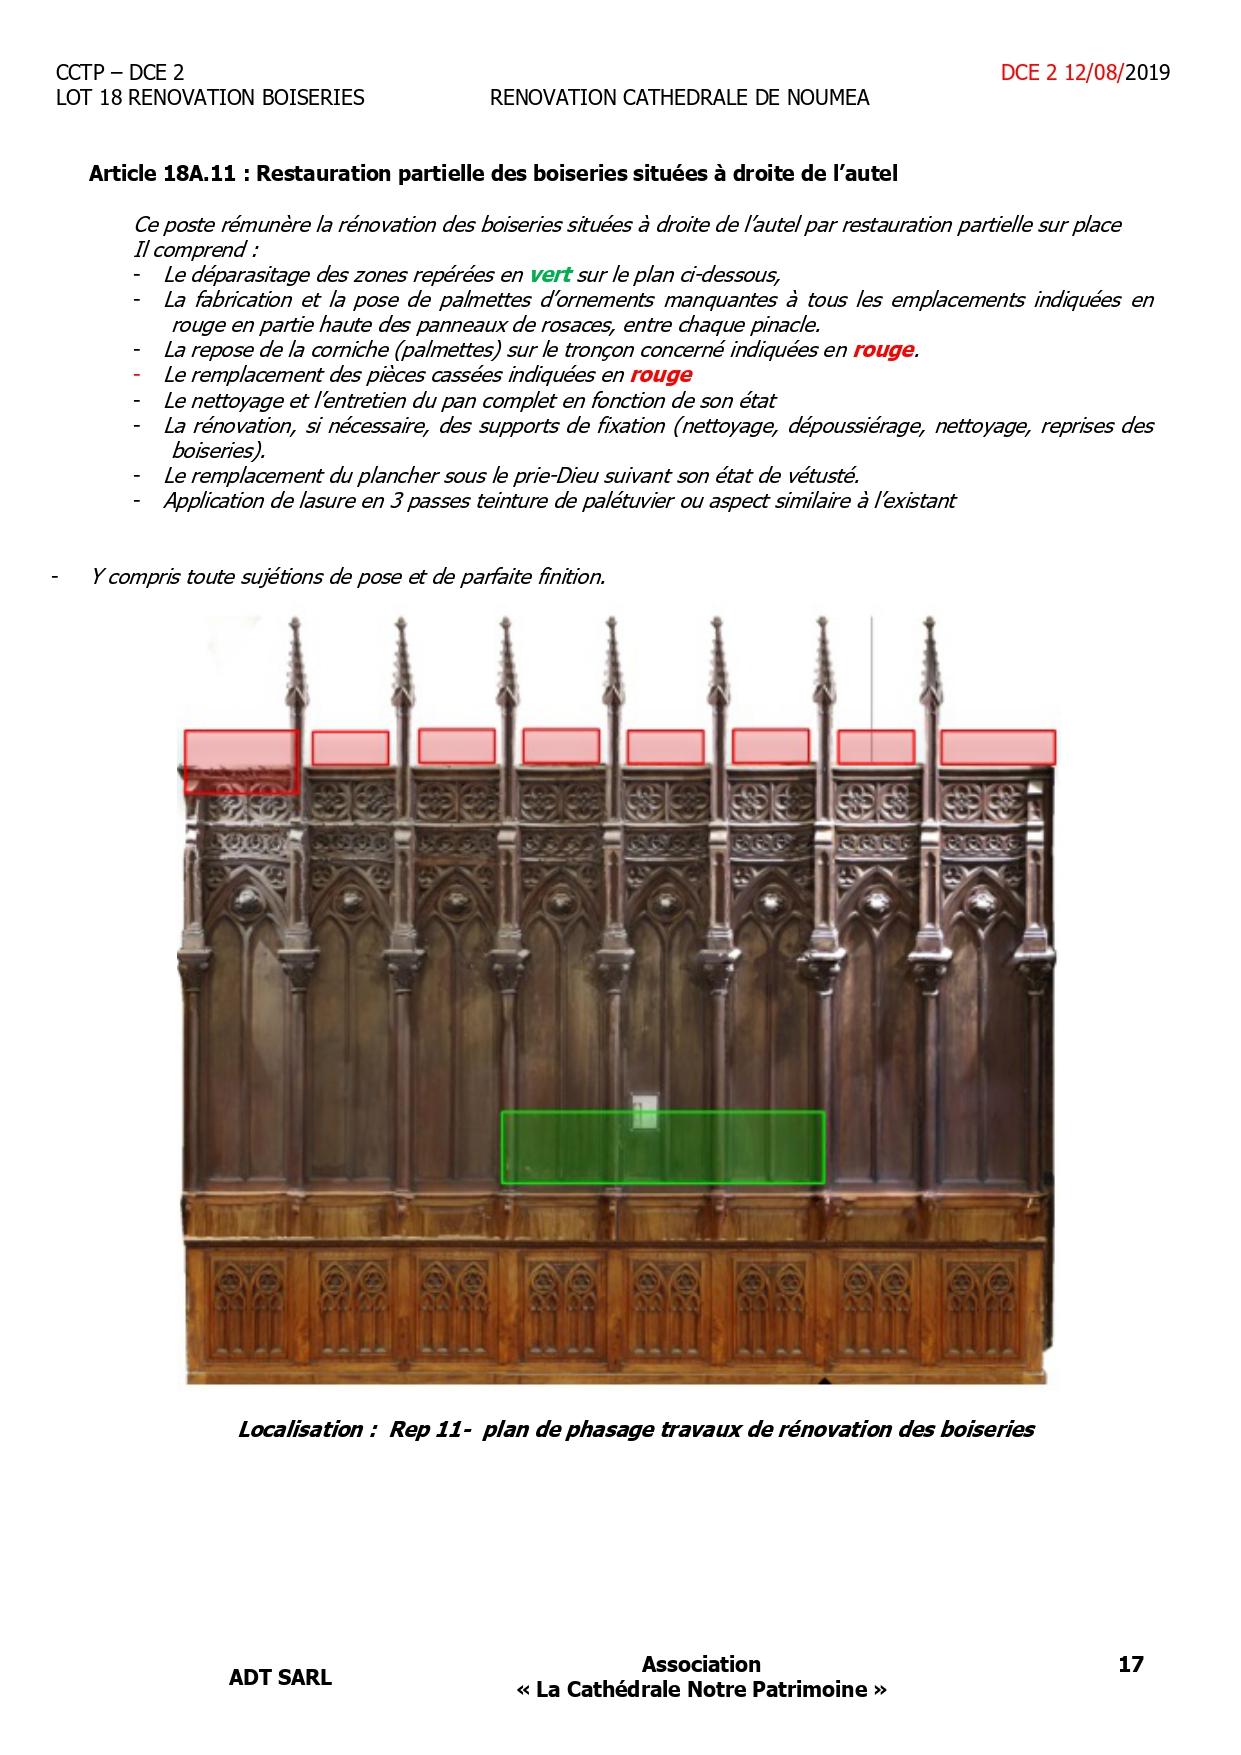 CCTP - RENOV BOISERIES 05